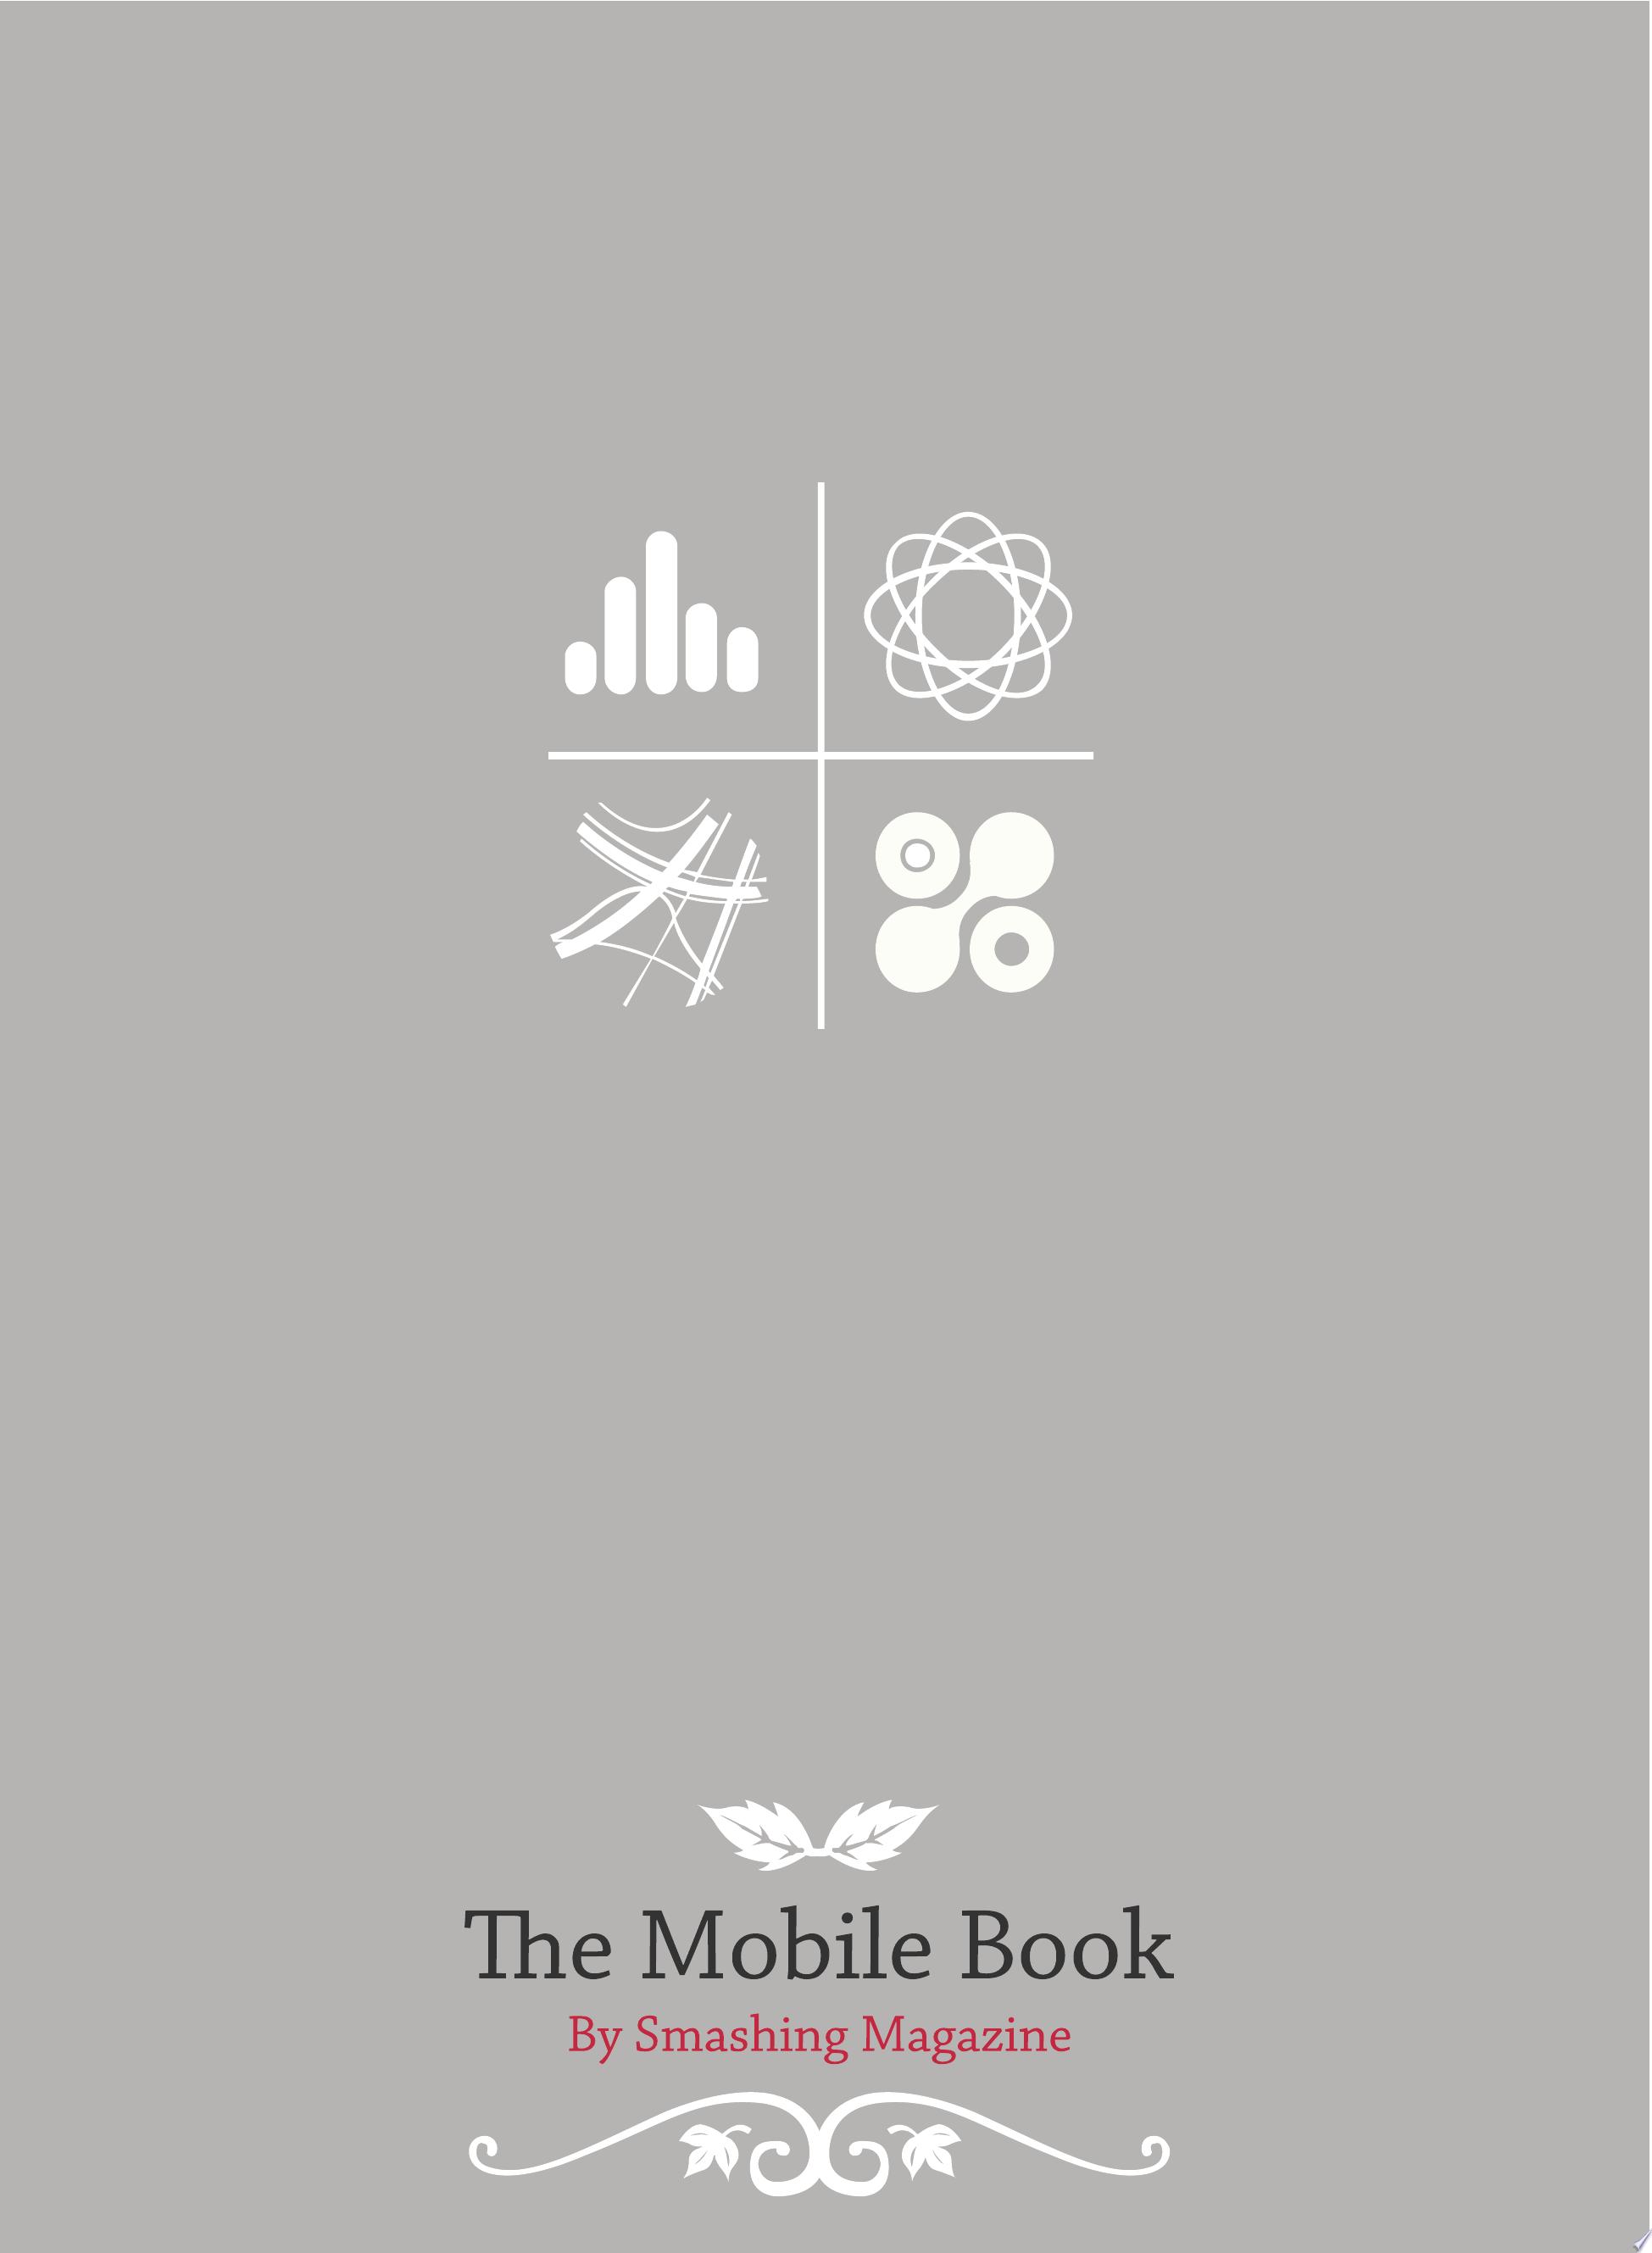 The Mobile Book